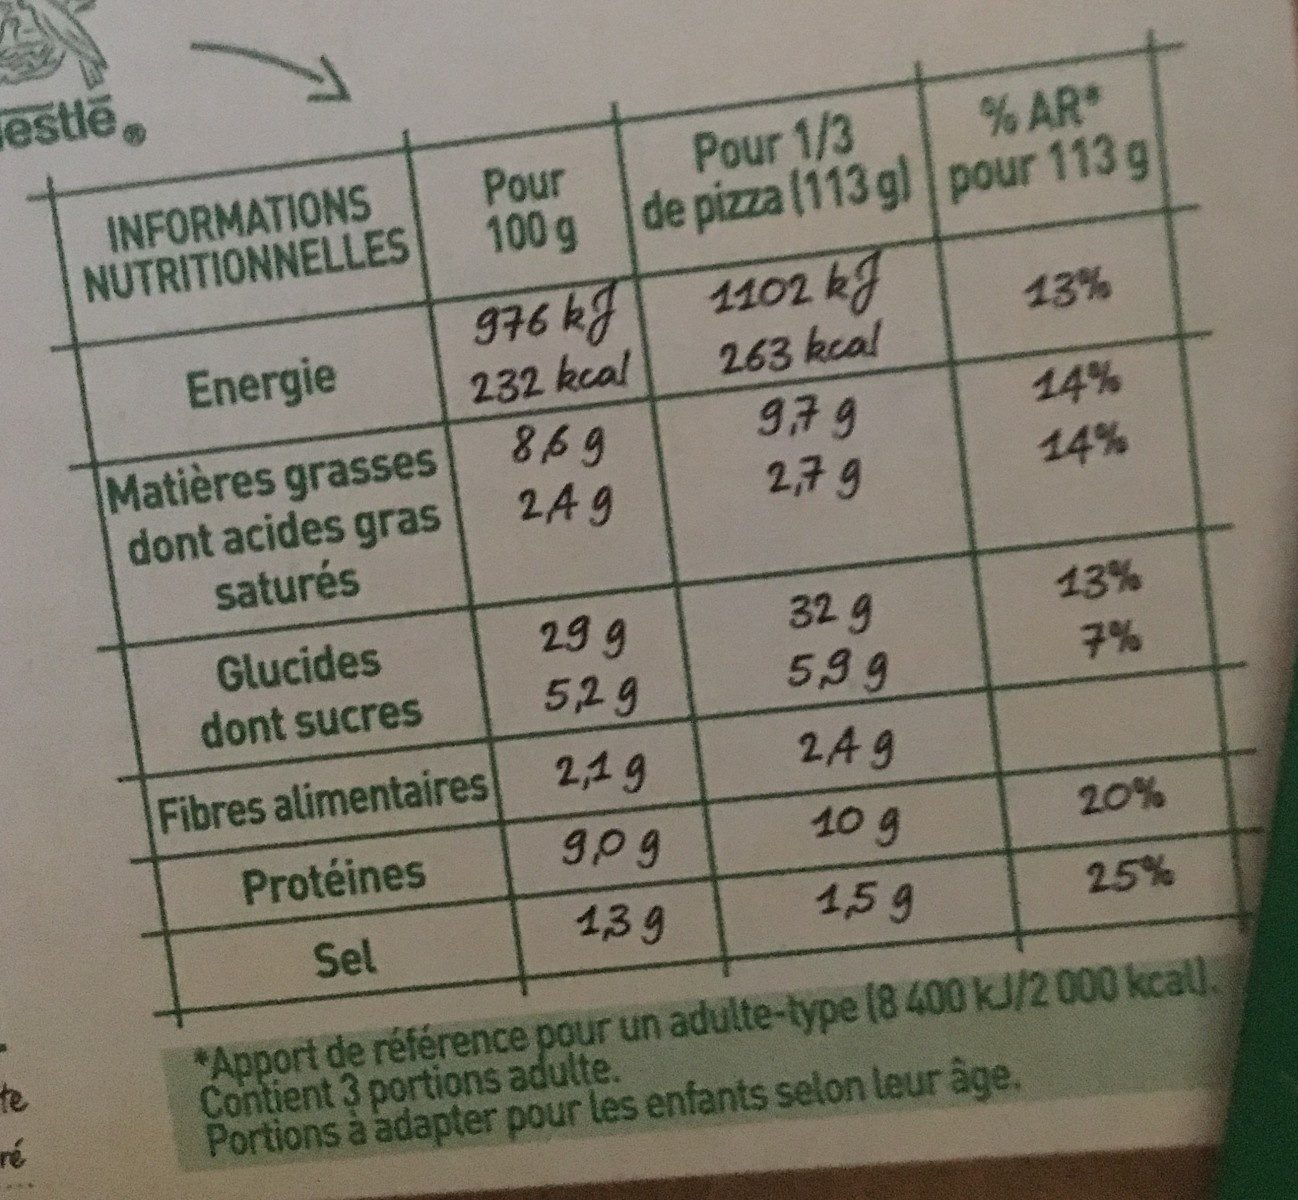 BUITONI FOUR A PIERRE Pizza Thon - Valori nutrizionali - fr